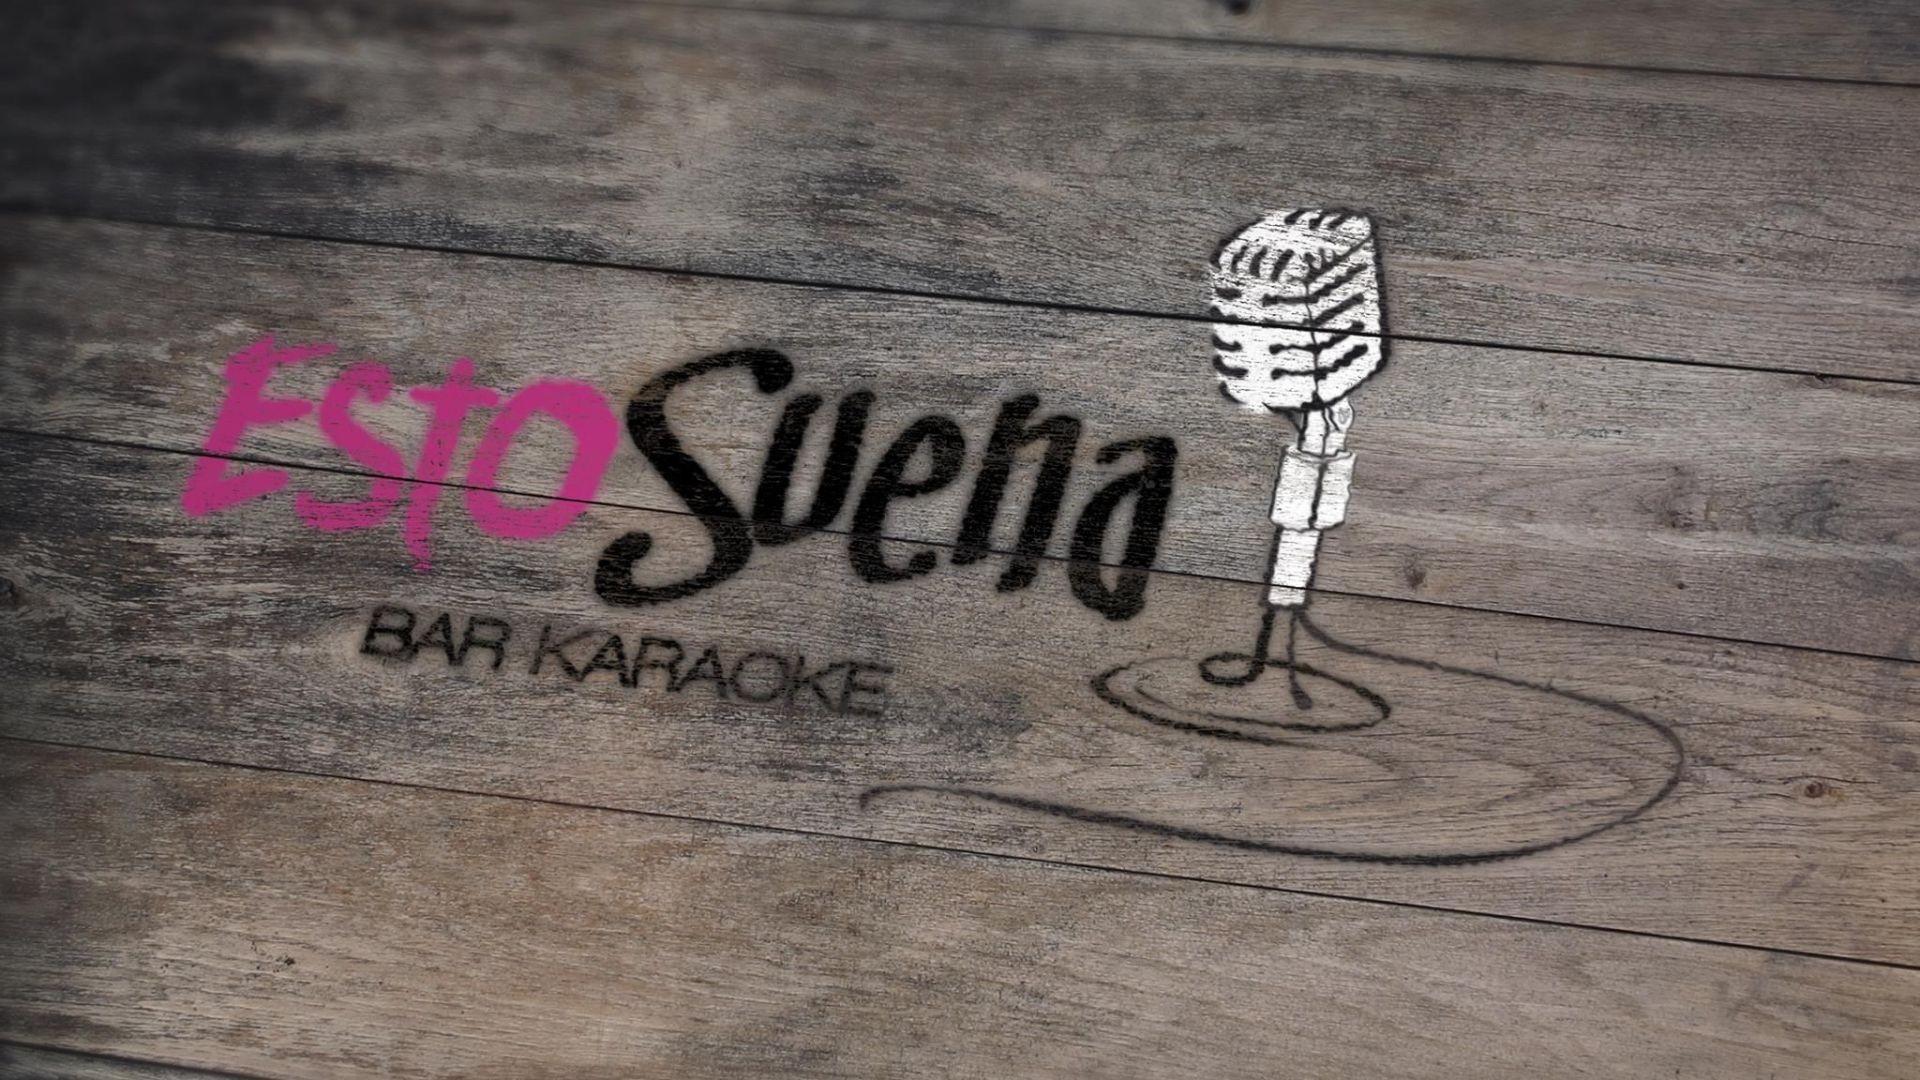 Tu karaoke en Coslada